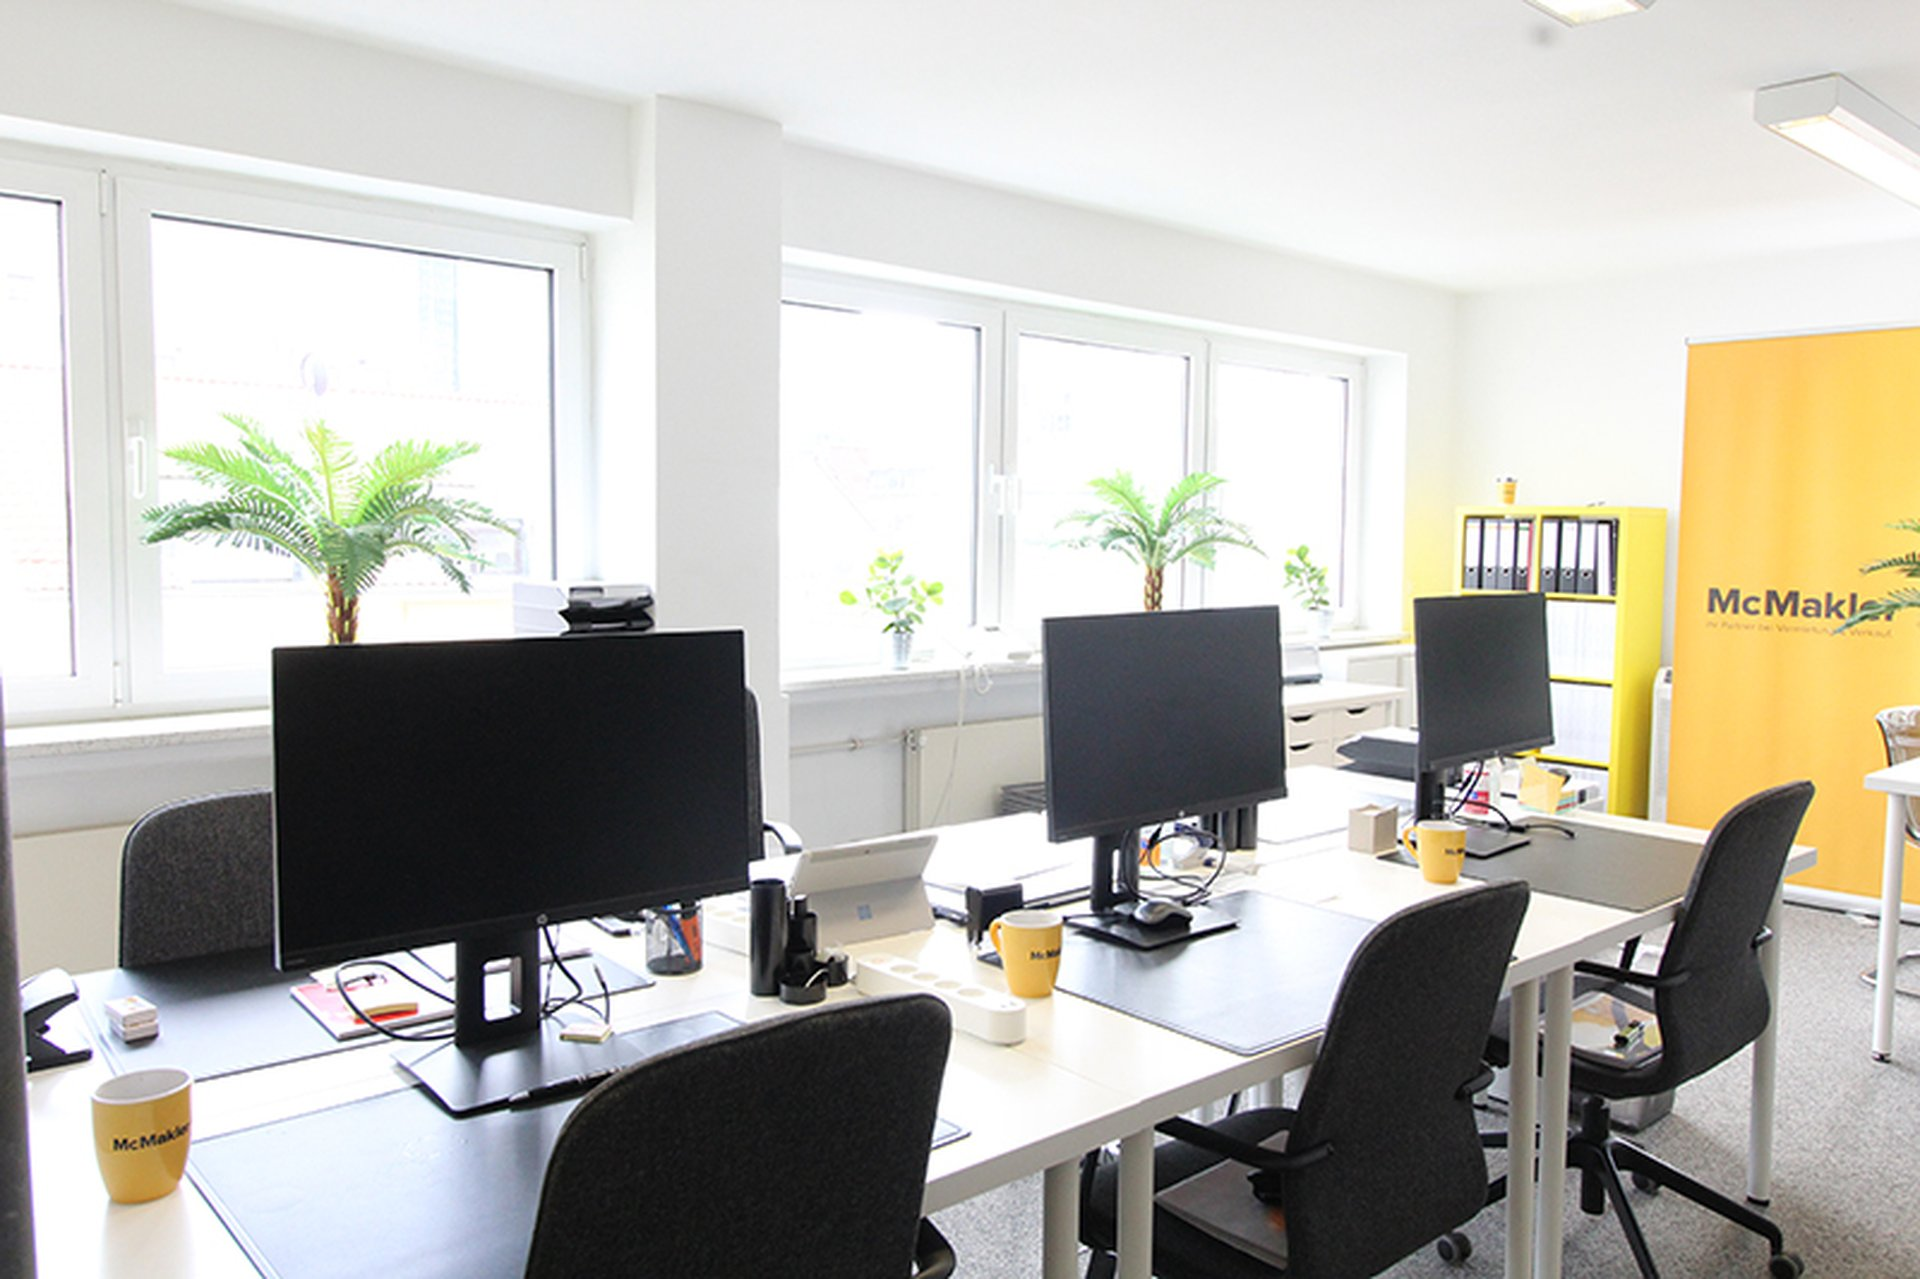 McMakler Büro in Frankfurt